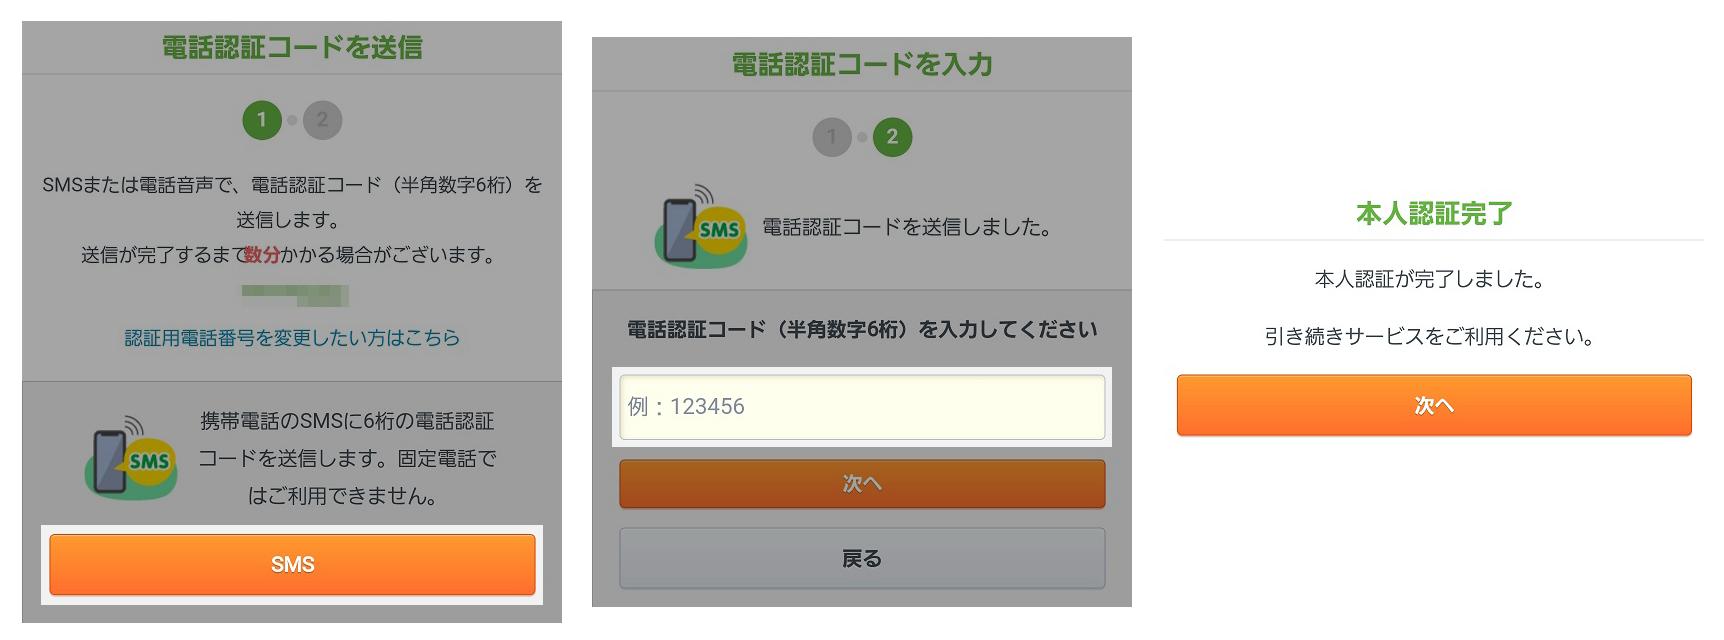 PeX,SMS認証